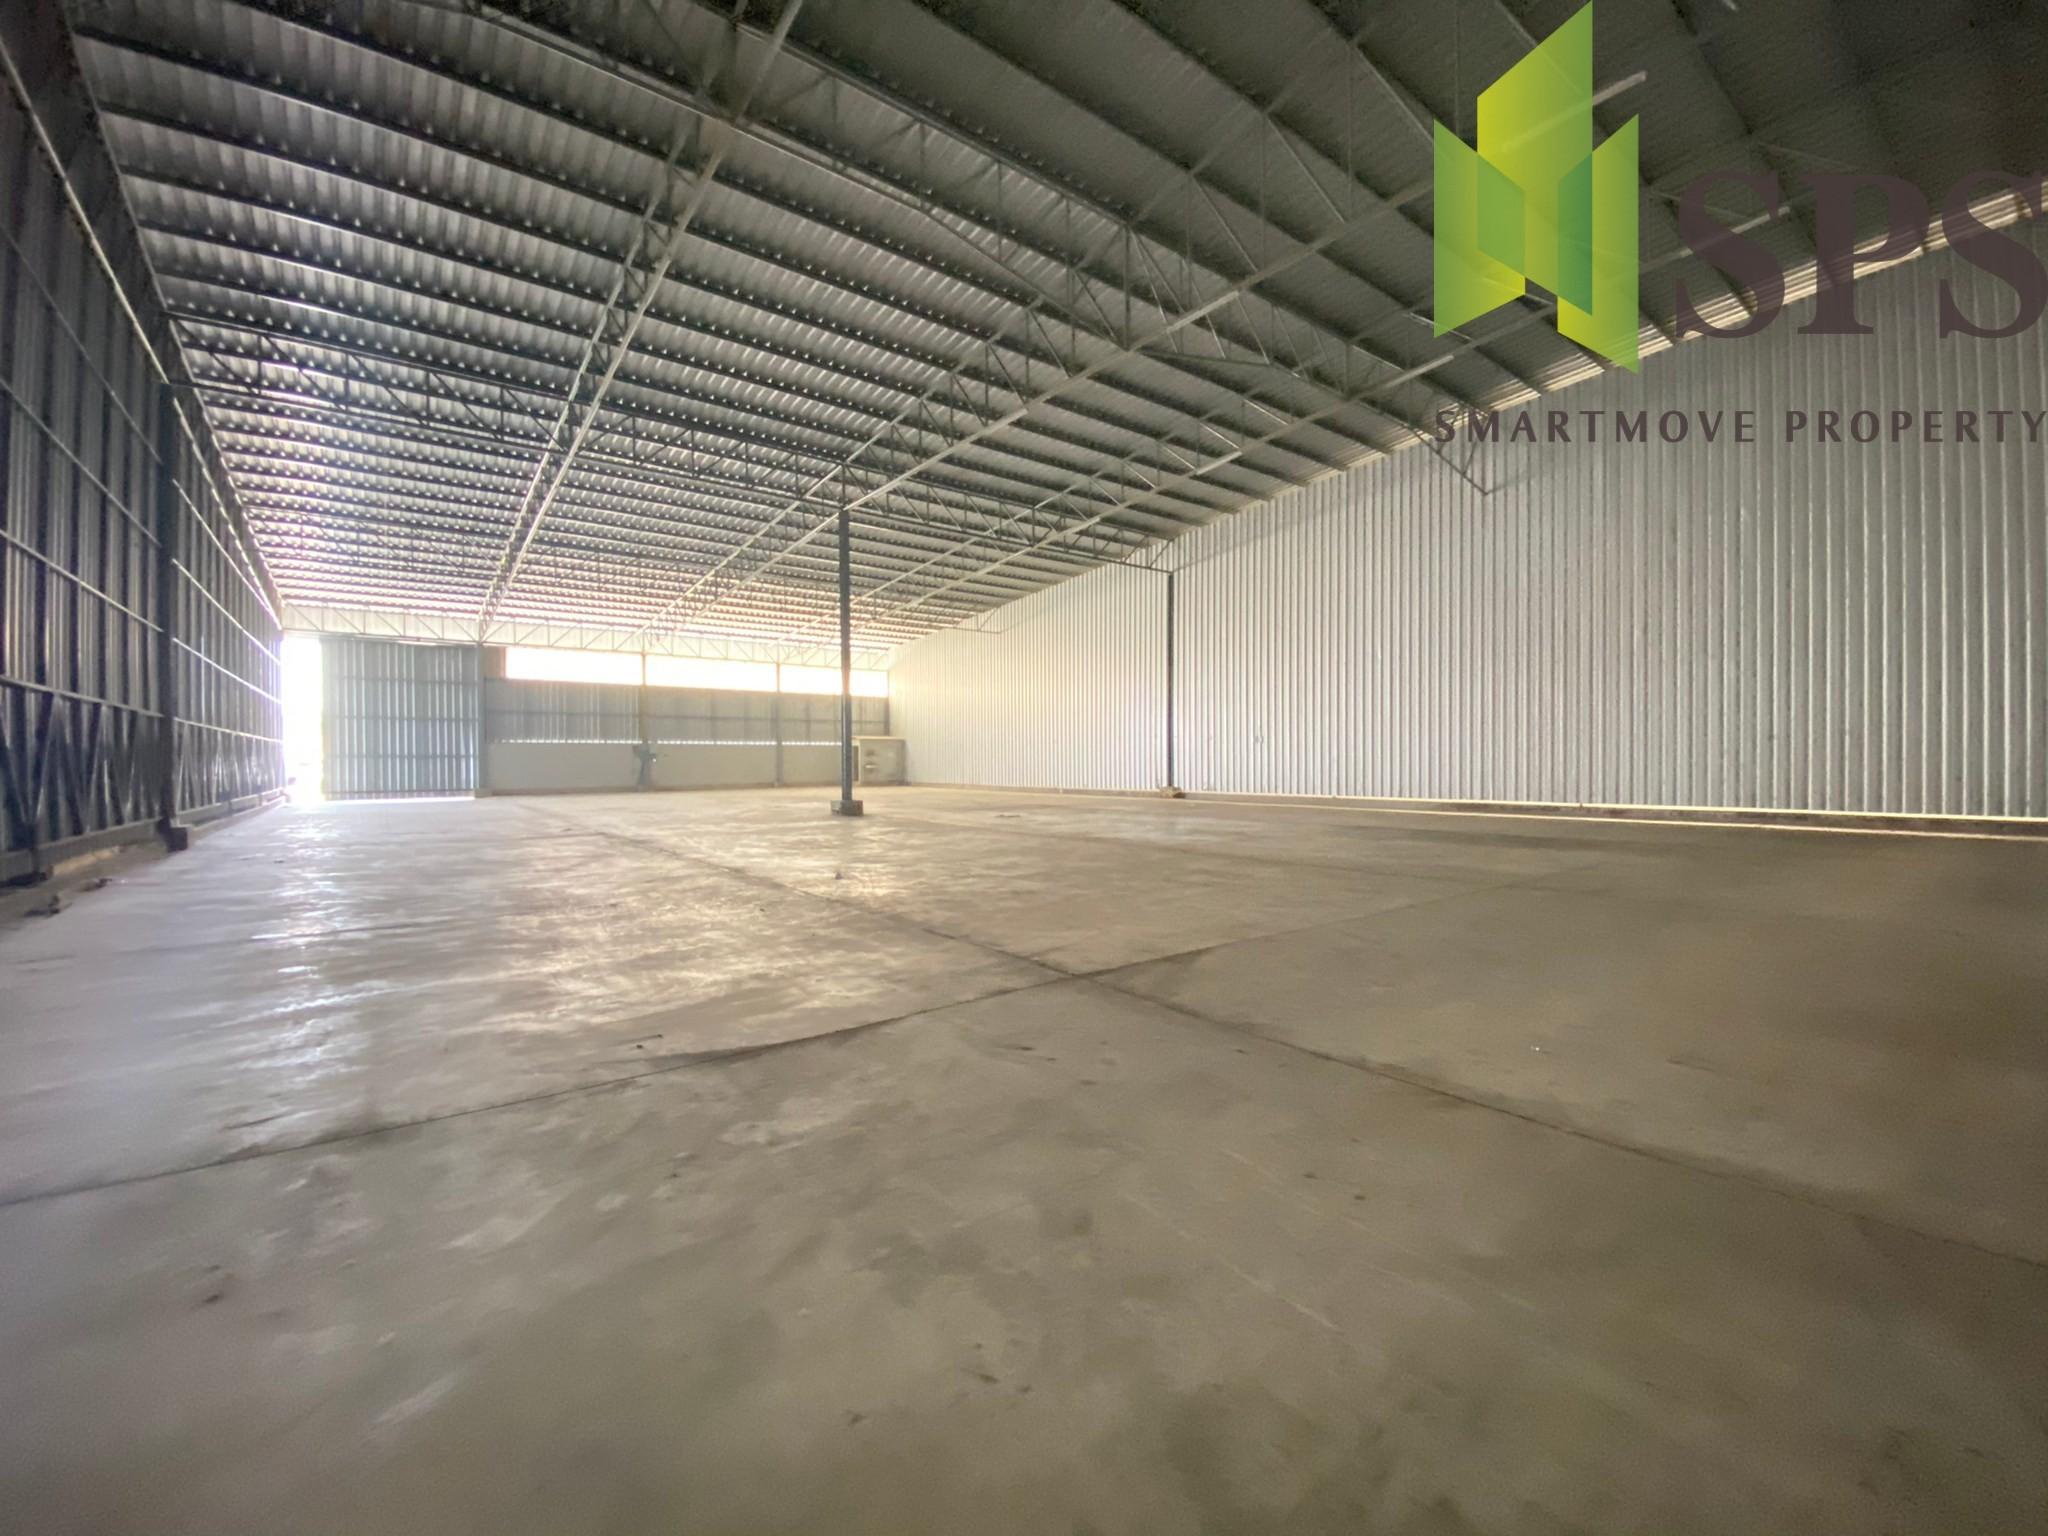 Warehouse for RENT at Bang Bo, Samut Prakan/ โกดัง สำหรับเช่า ที่ บางบ่อ สมุทรปราการ (Property ID: SPS-PPW158)